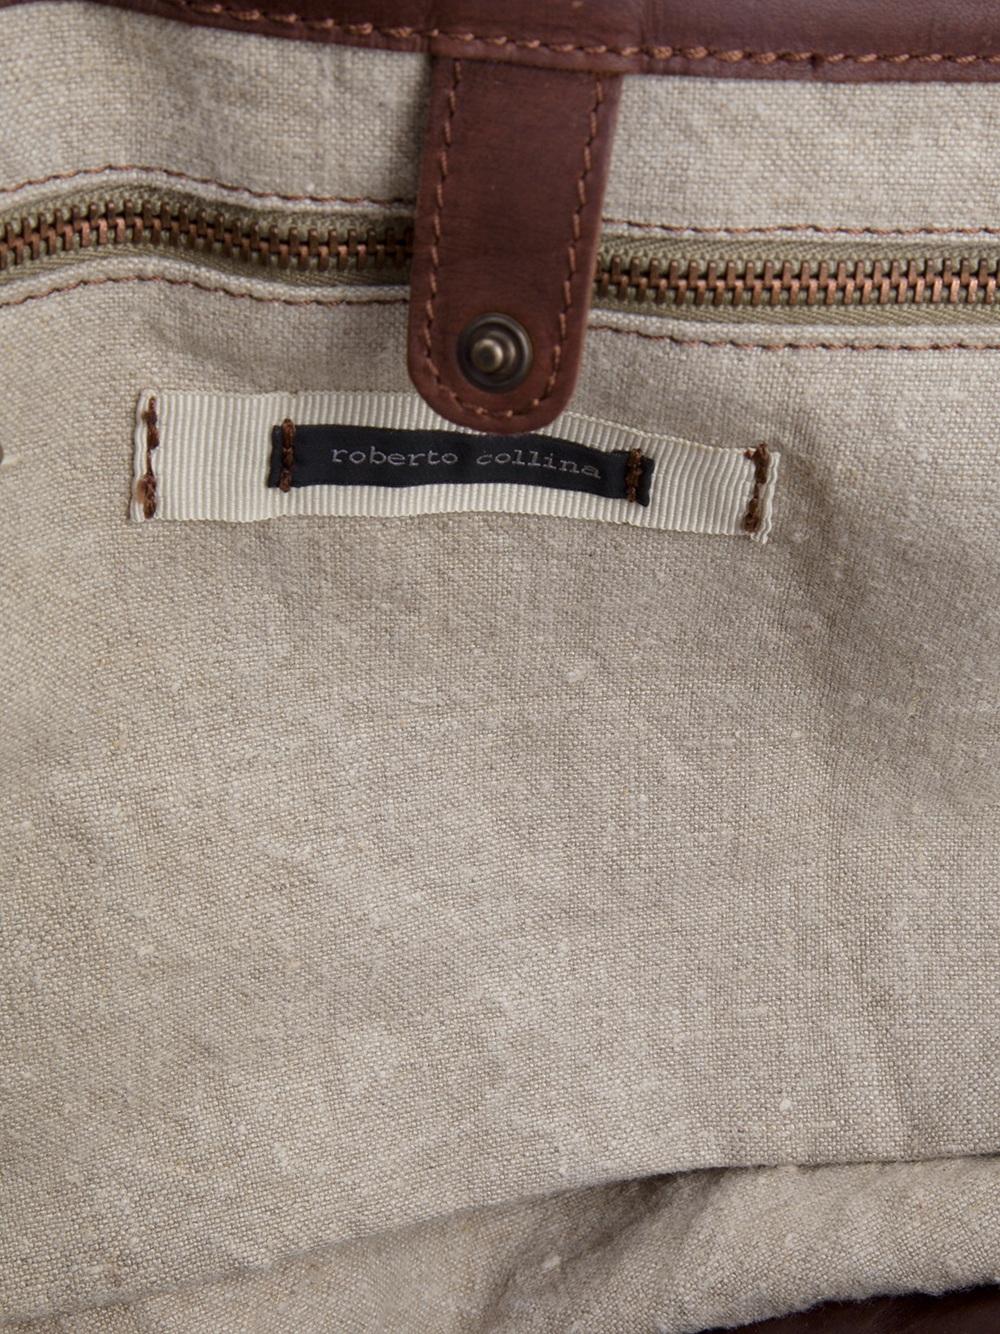 Roberto Collina Tote Bag in Natural for Men